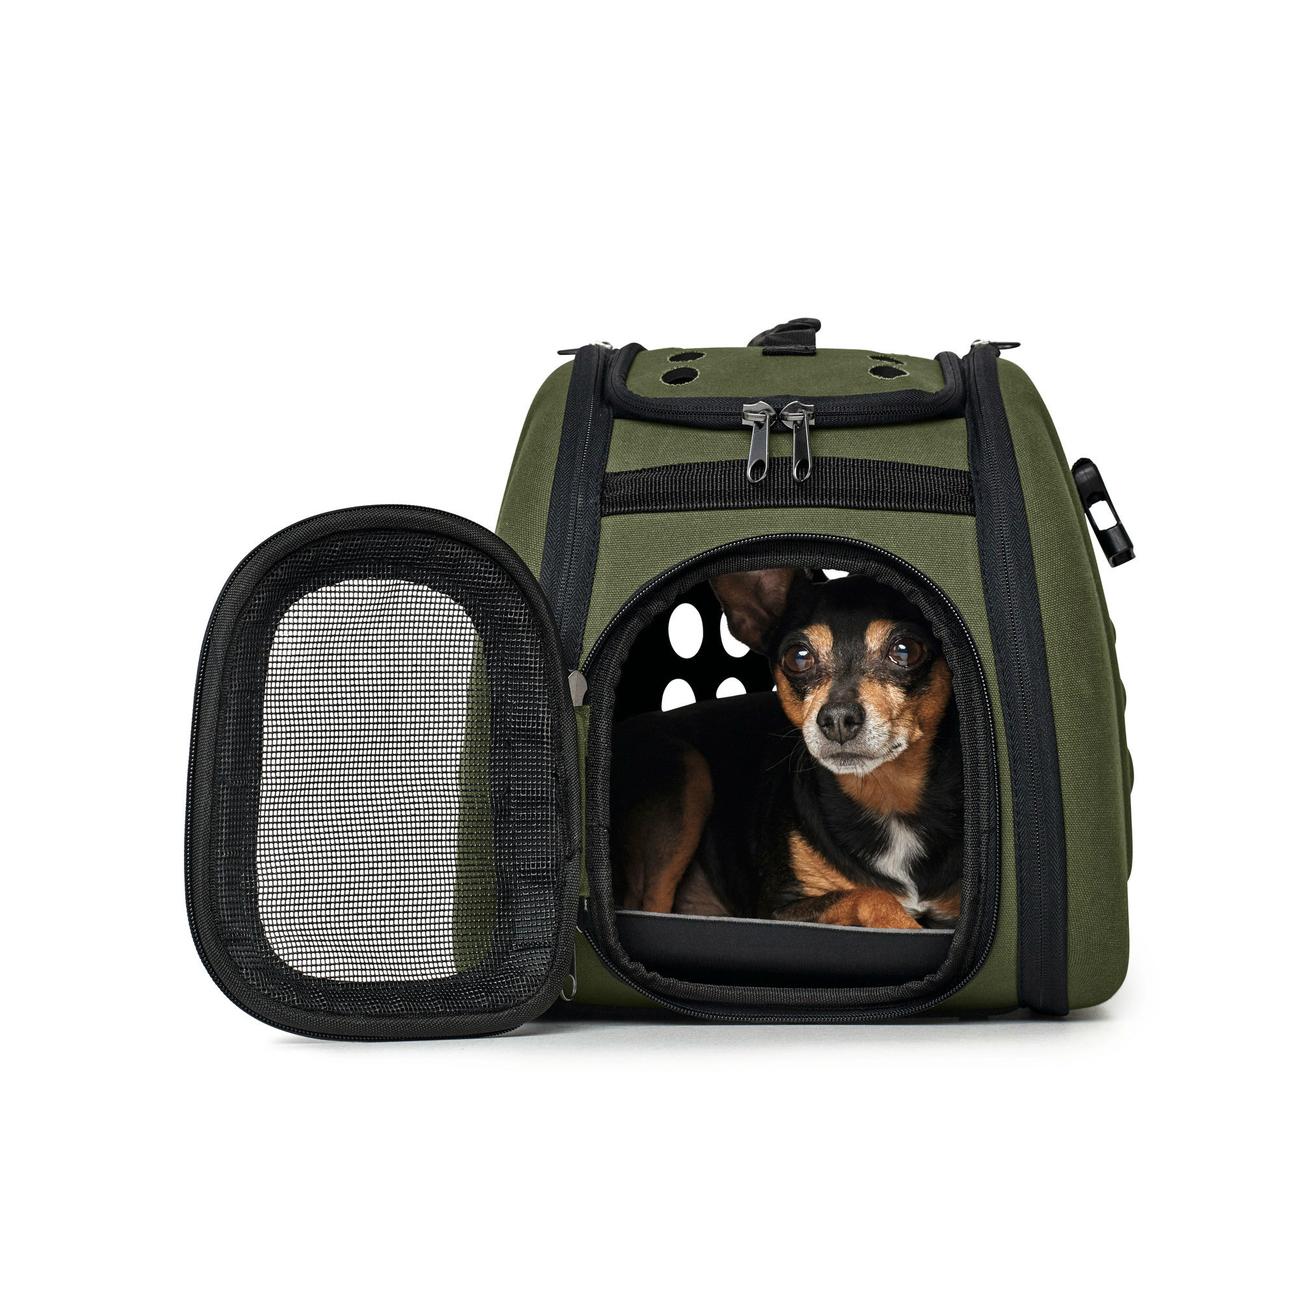 Hunter Hunde Tragetasche Nizza 65713, Bild 9